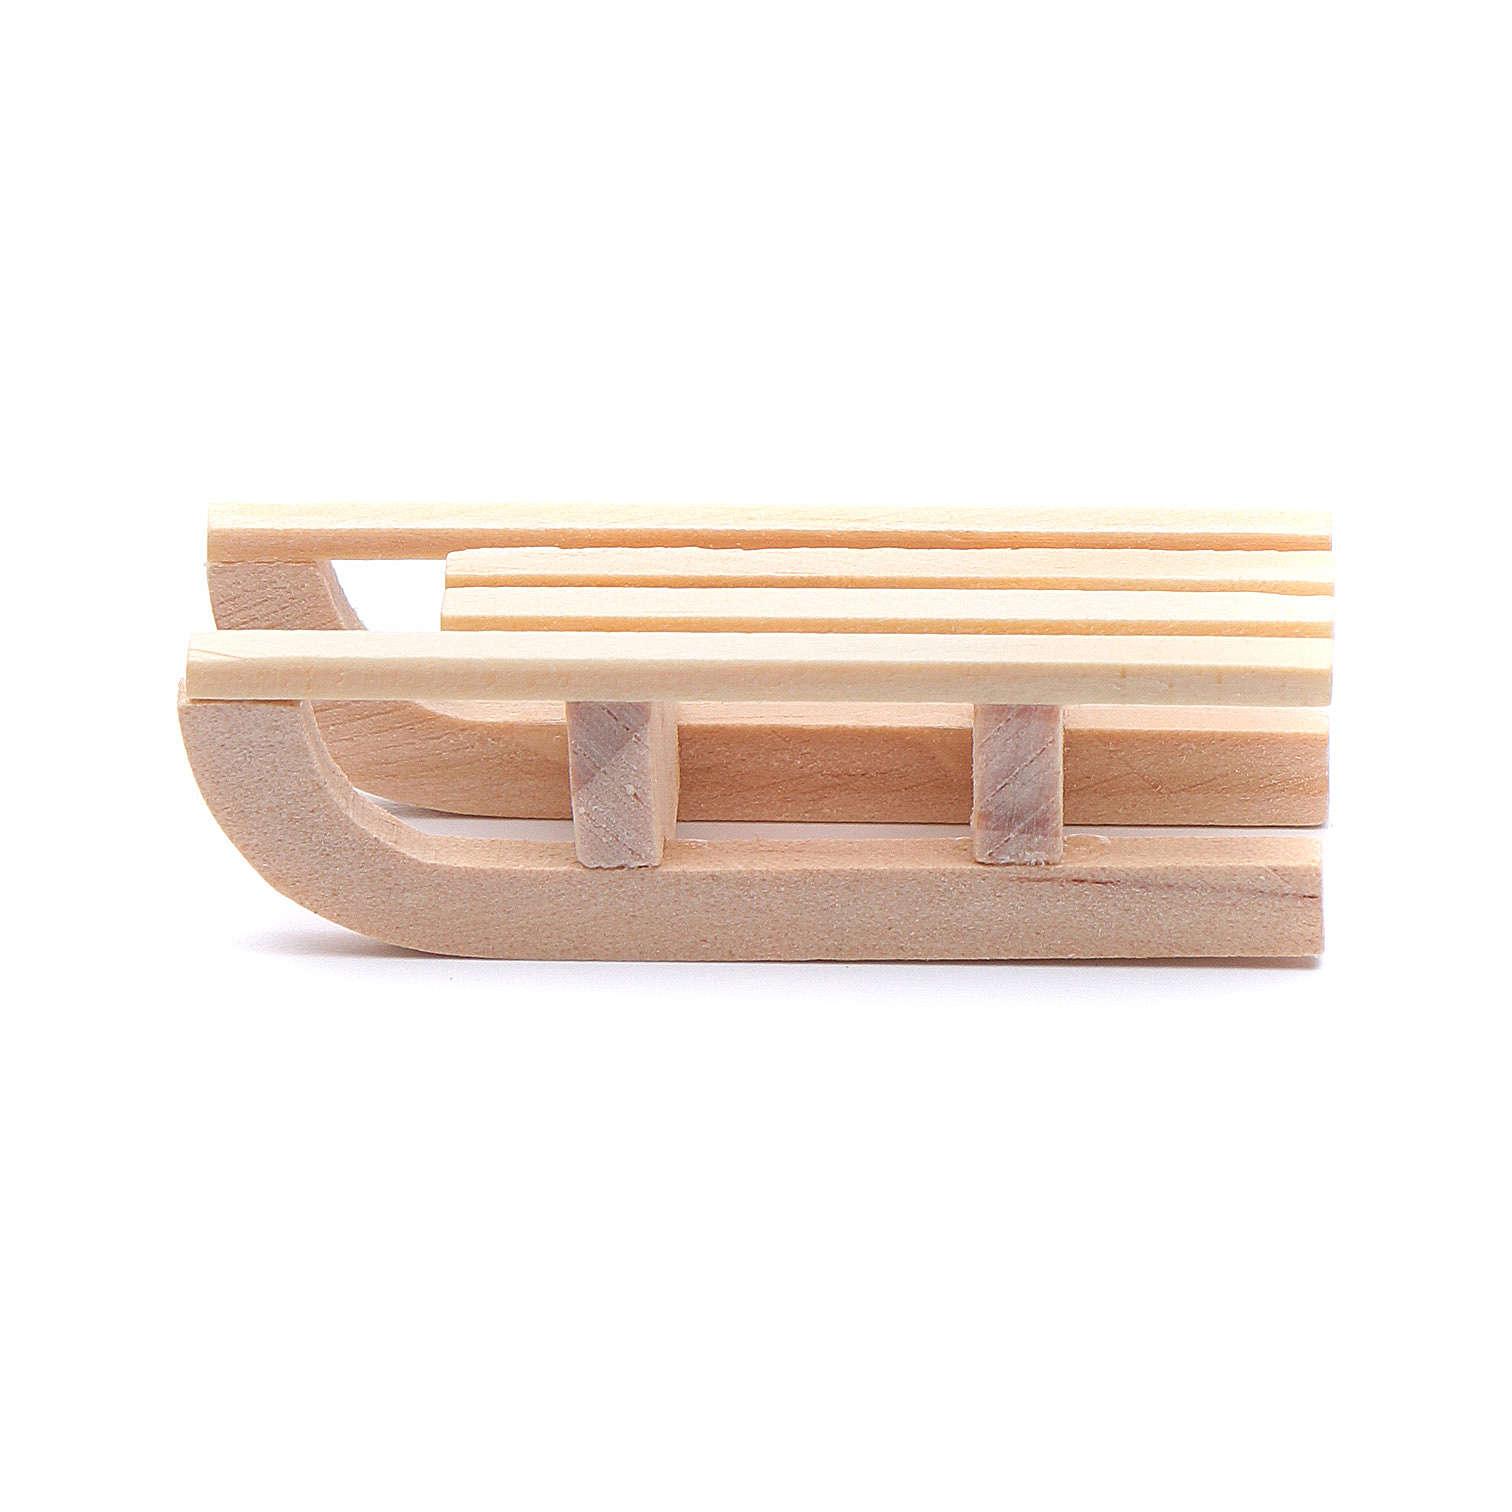 Slitta legno 1,5x5x2 cm per presepe 4